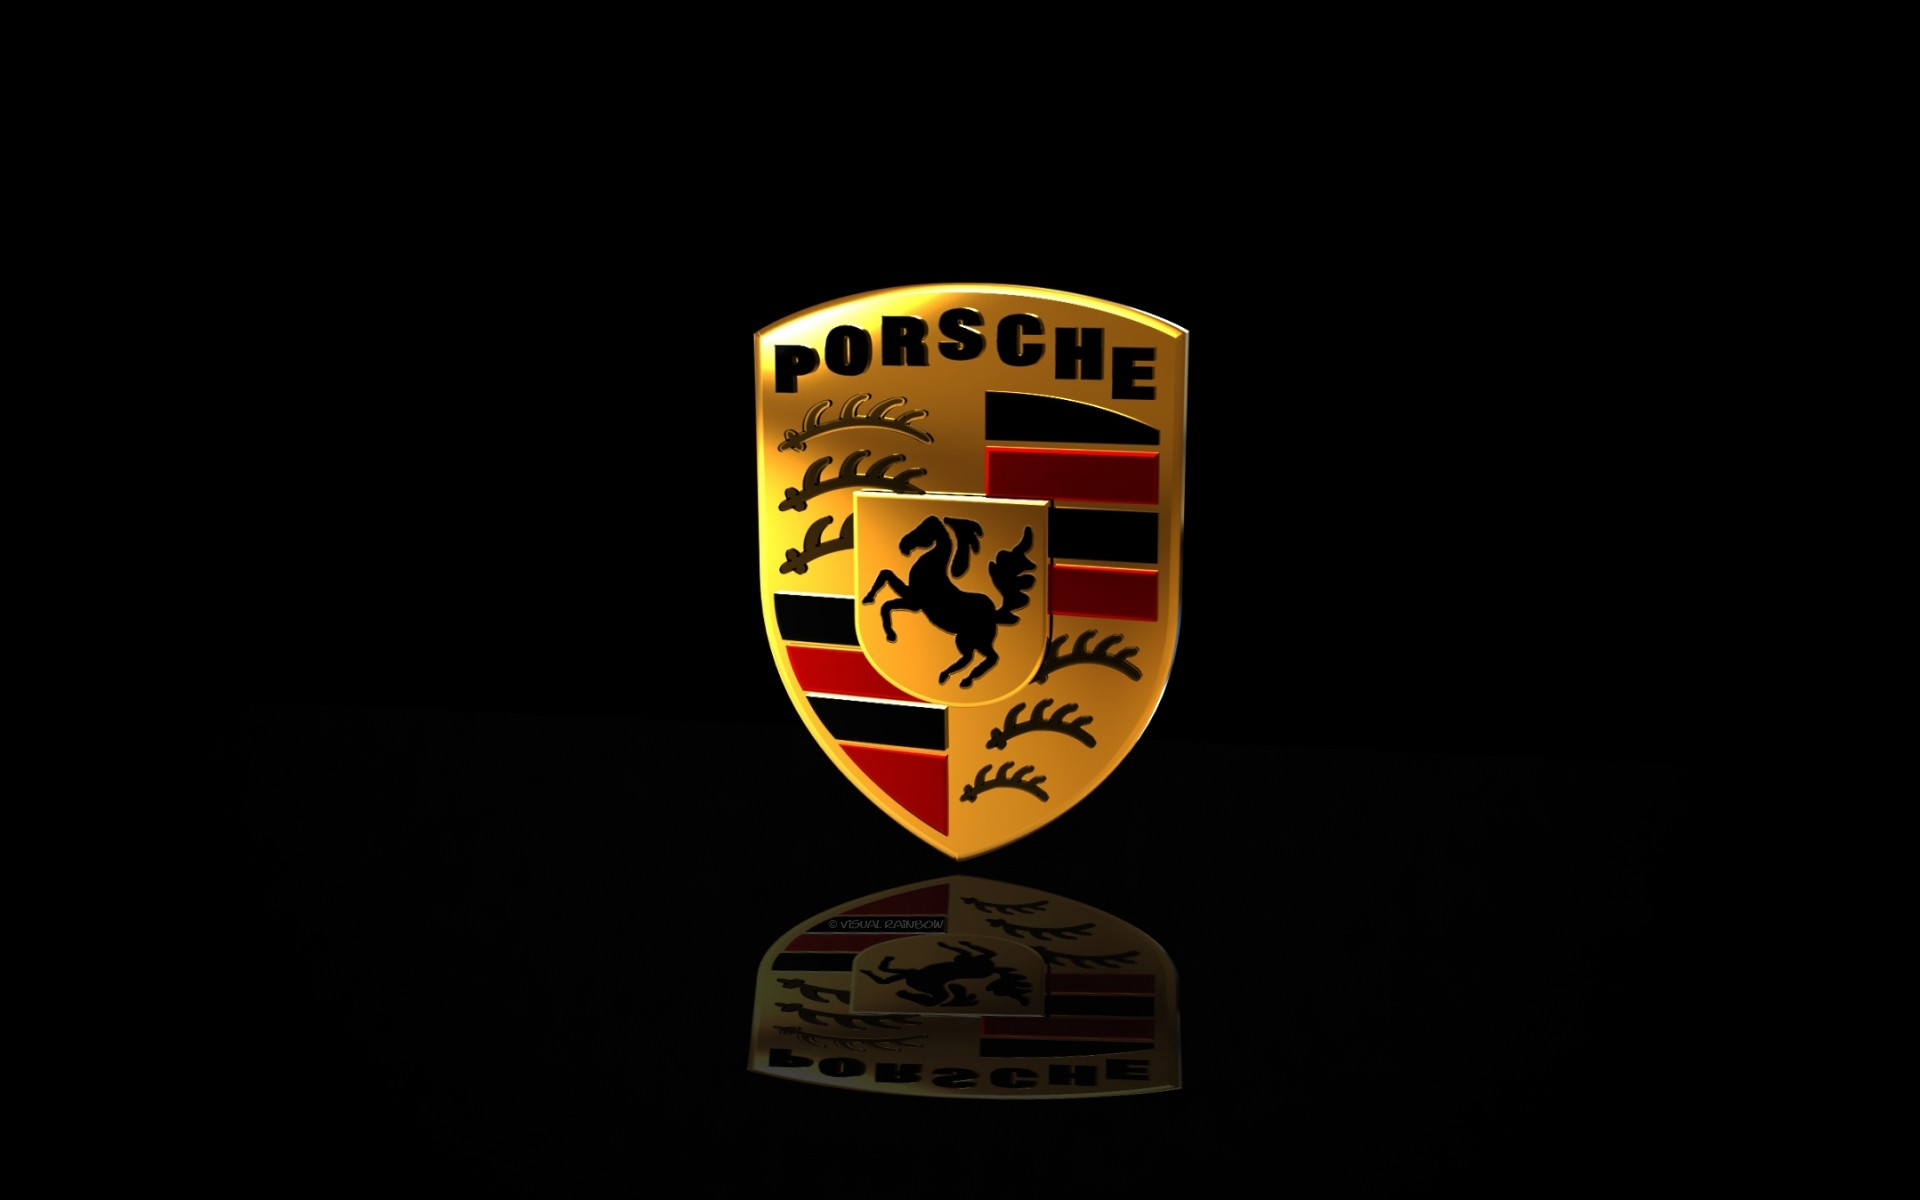 Porsche Logo Widescreen Wallpaper 1920×1200